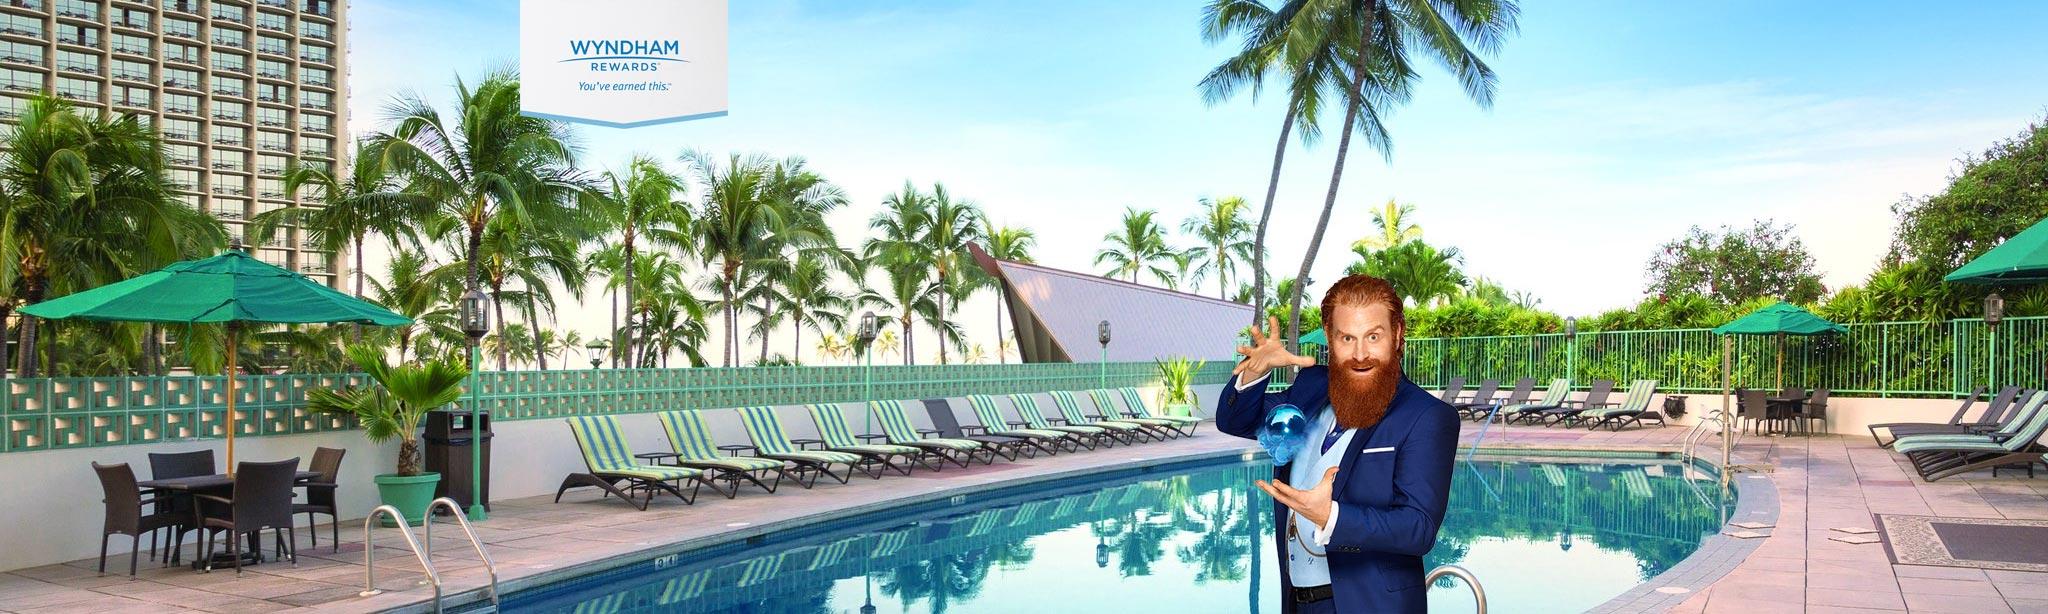 Wyndham Rewards Reservations at Wyndham Extra Holidays